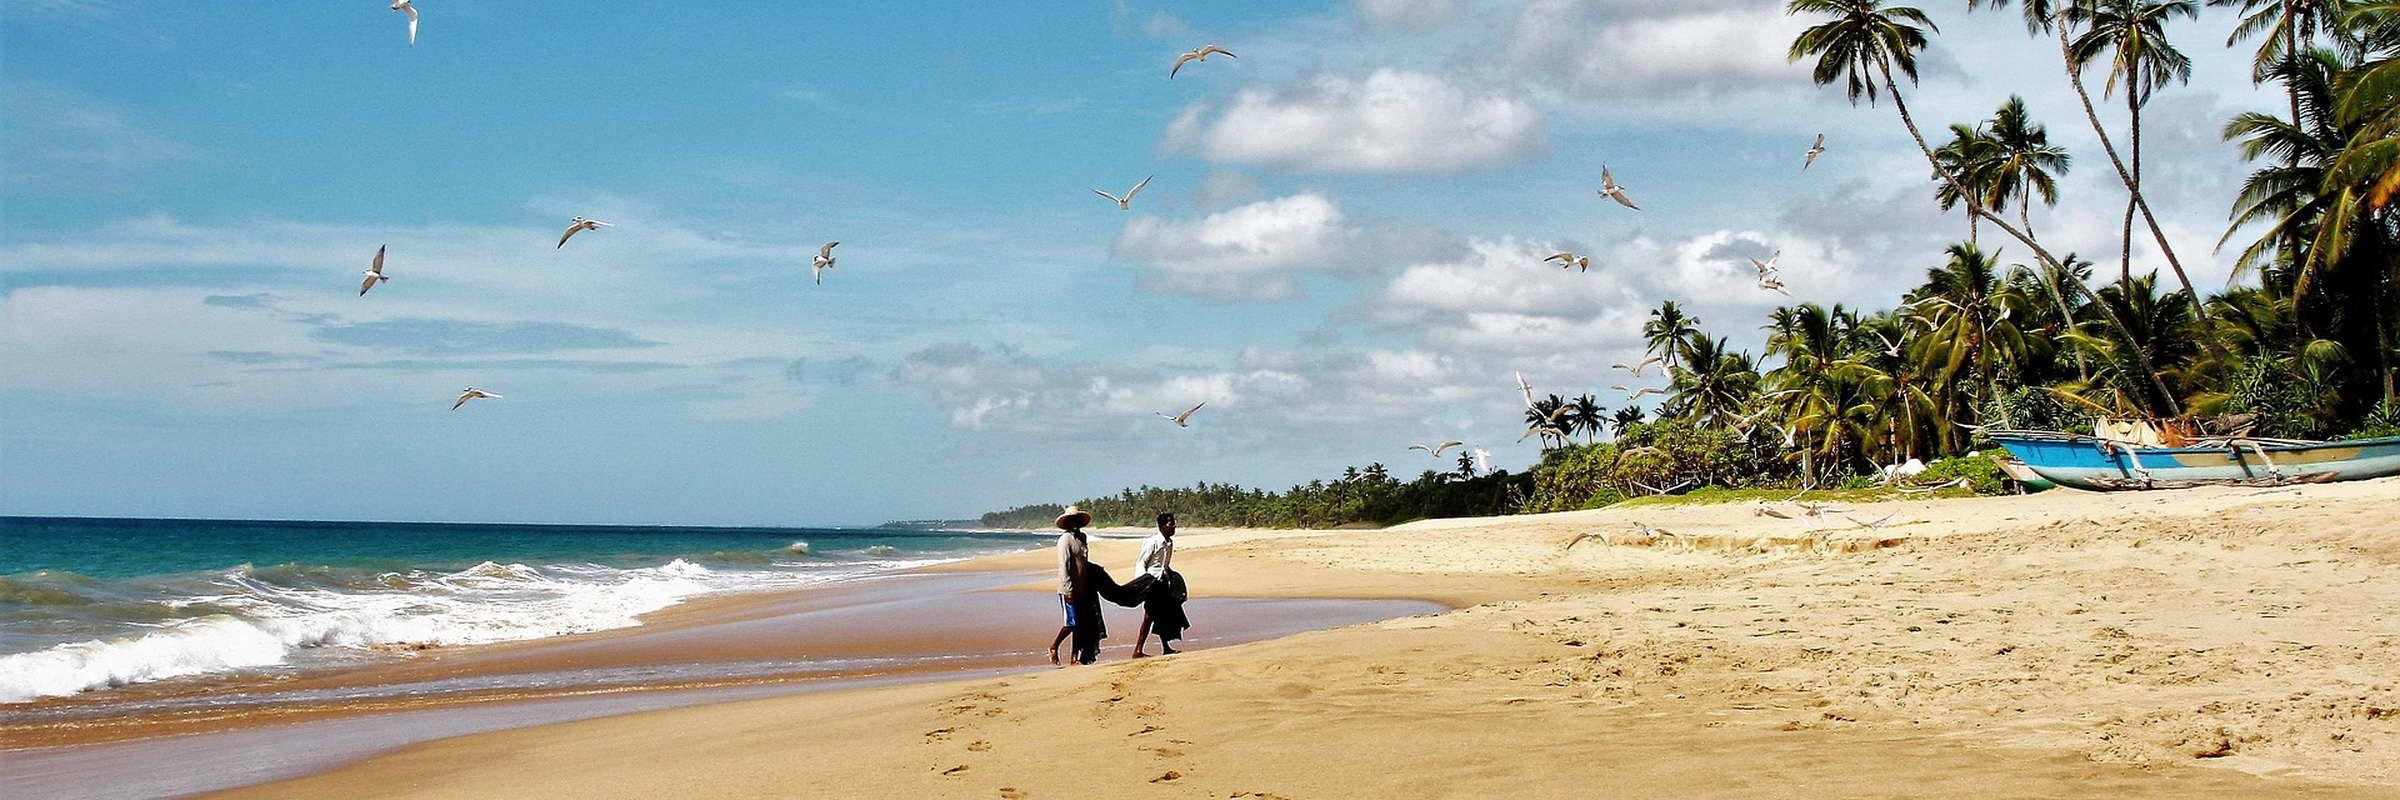 Badeurlaub auf Sri Lanka genießen